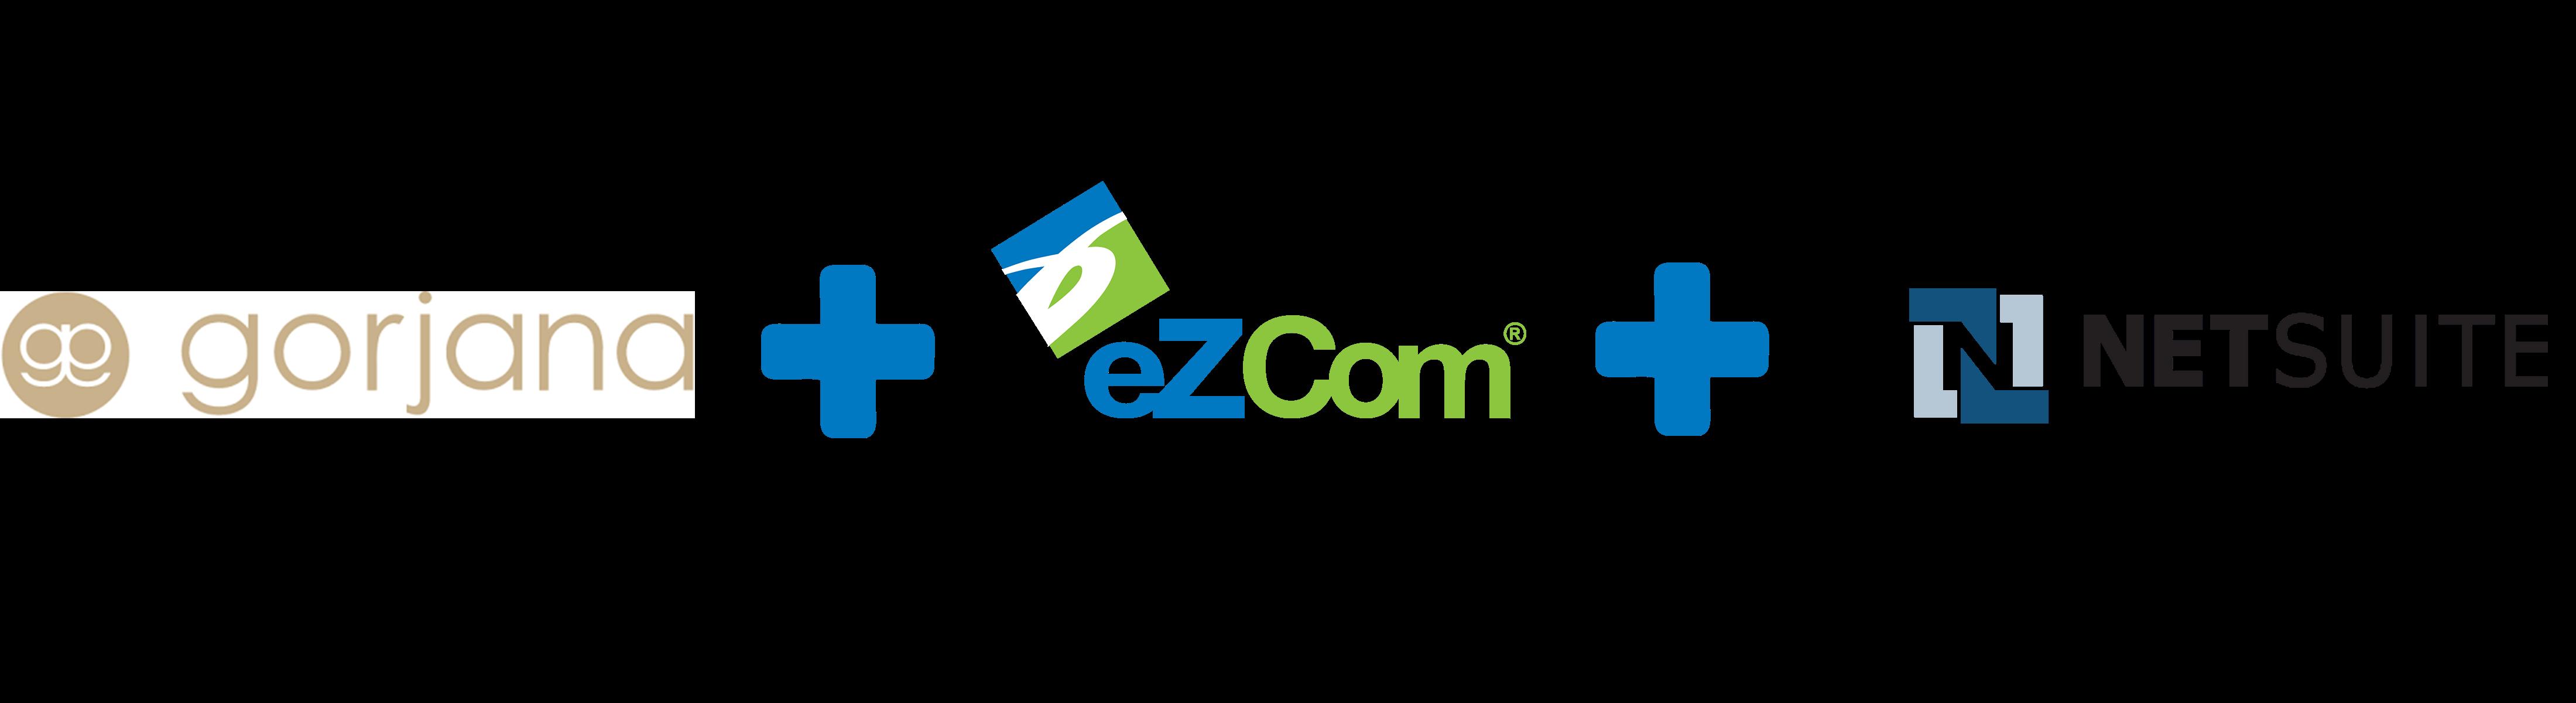 Gorjana plus eZCom plus NetSuite